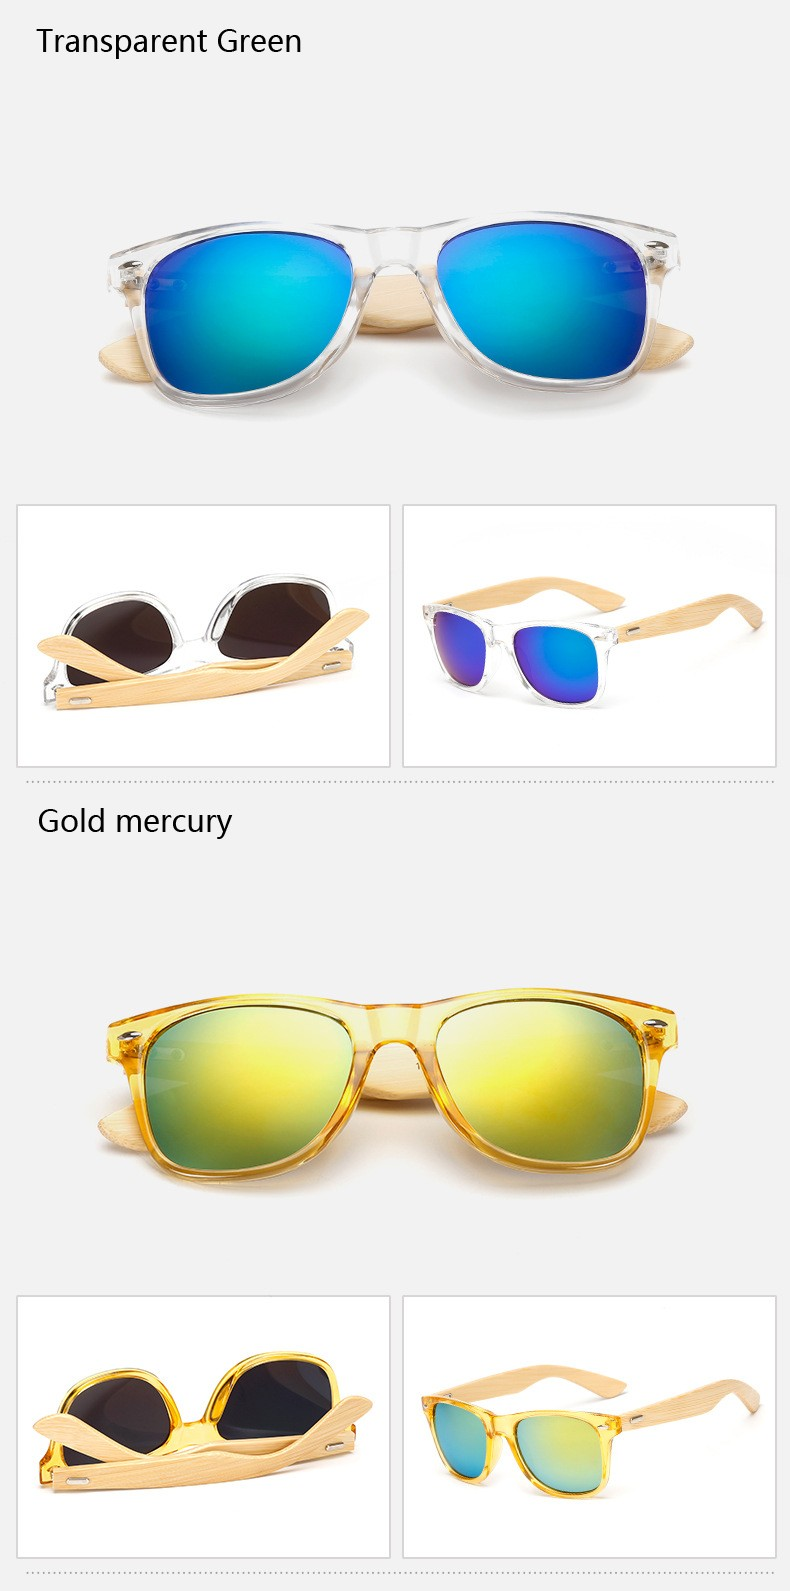 Ralferty Retro Wood Sunglasses Men Bamboo Sunglass Women Brand Design Sport Goggles Gold Mirror Sun Glasses Shades lunette oculo 15